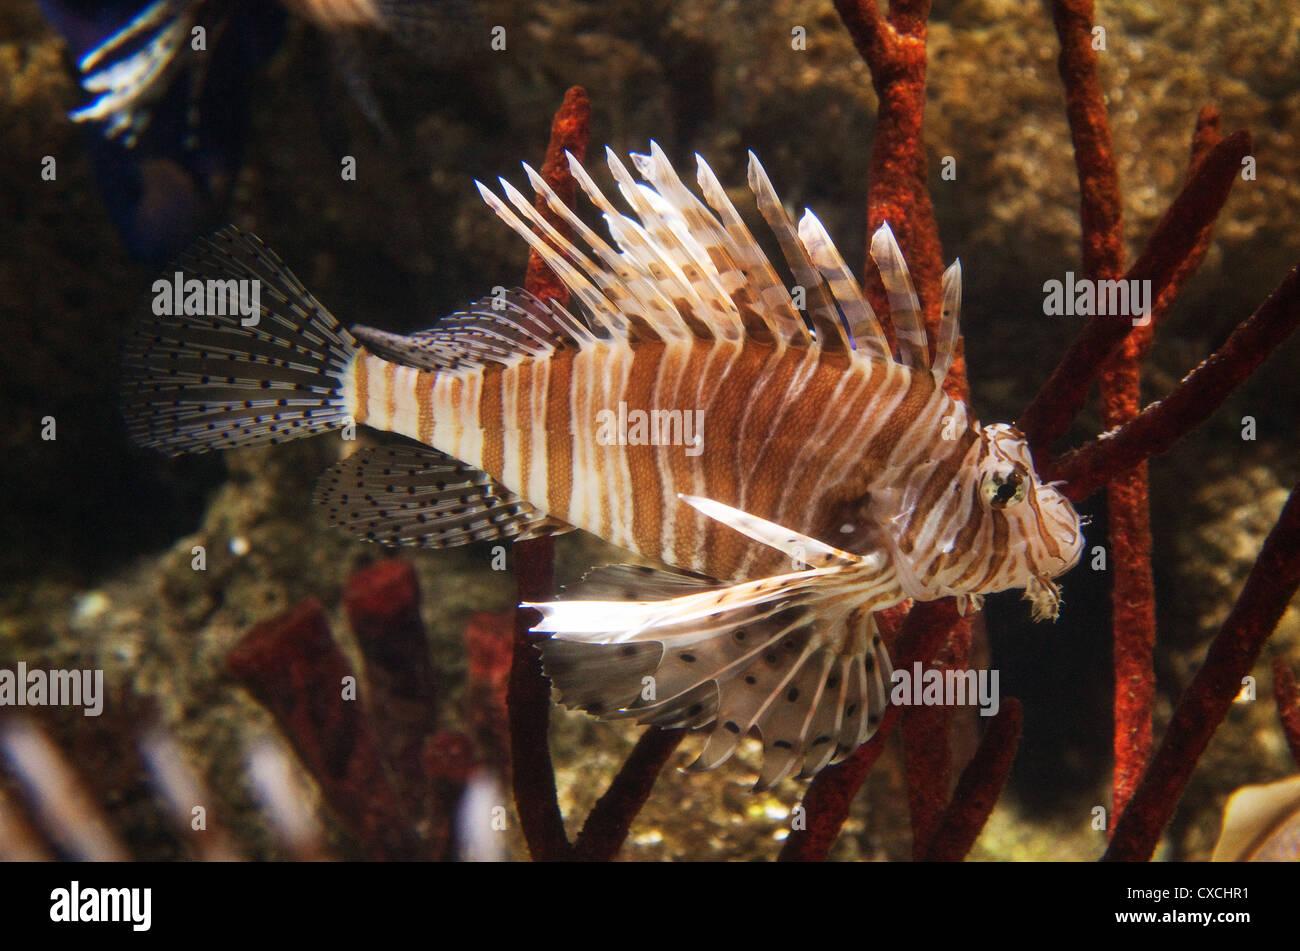 Buy fish for aquarium london - Lionfish Pterois The London Aquarium South Bank London Uk Stock